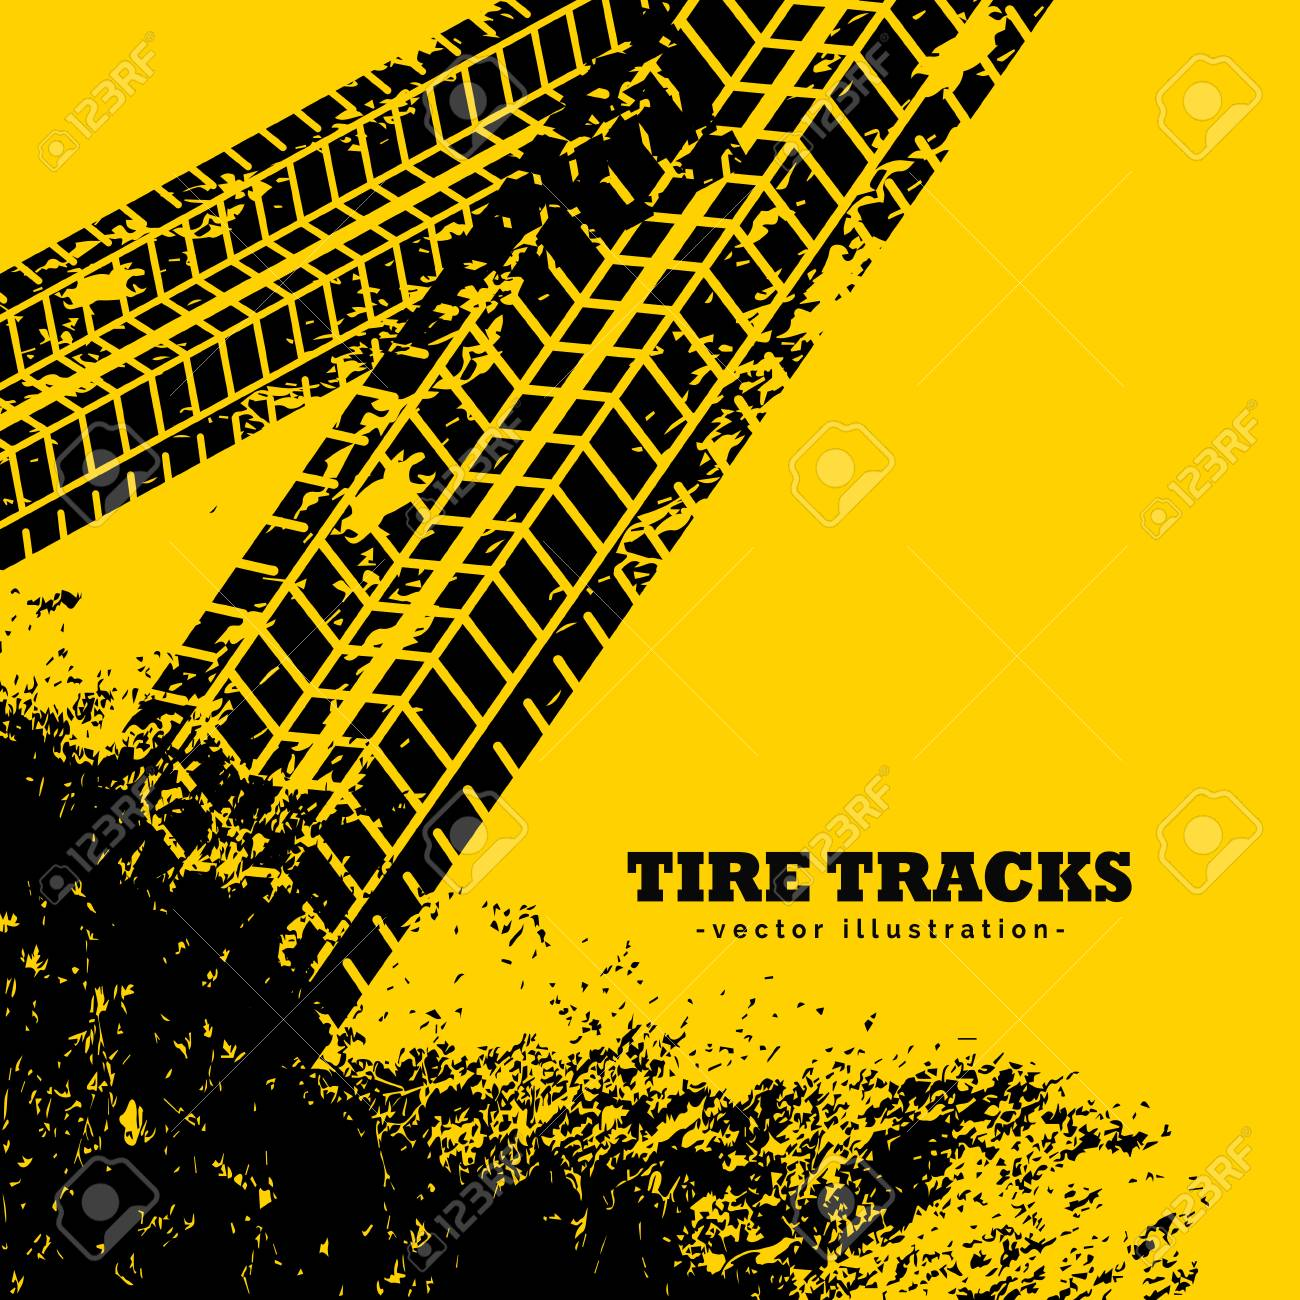 tire tracks marks on grunge yellow background - 76588343